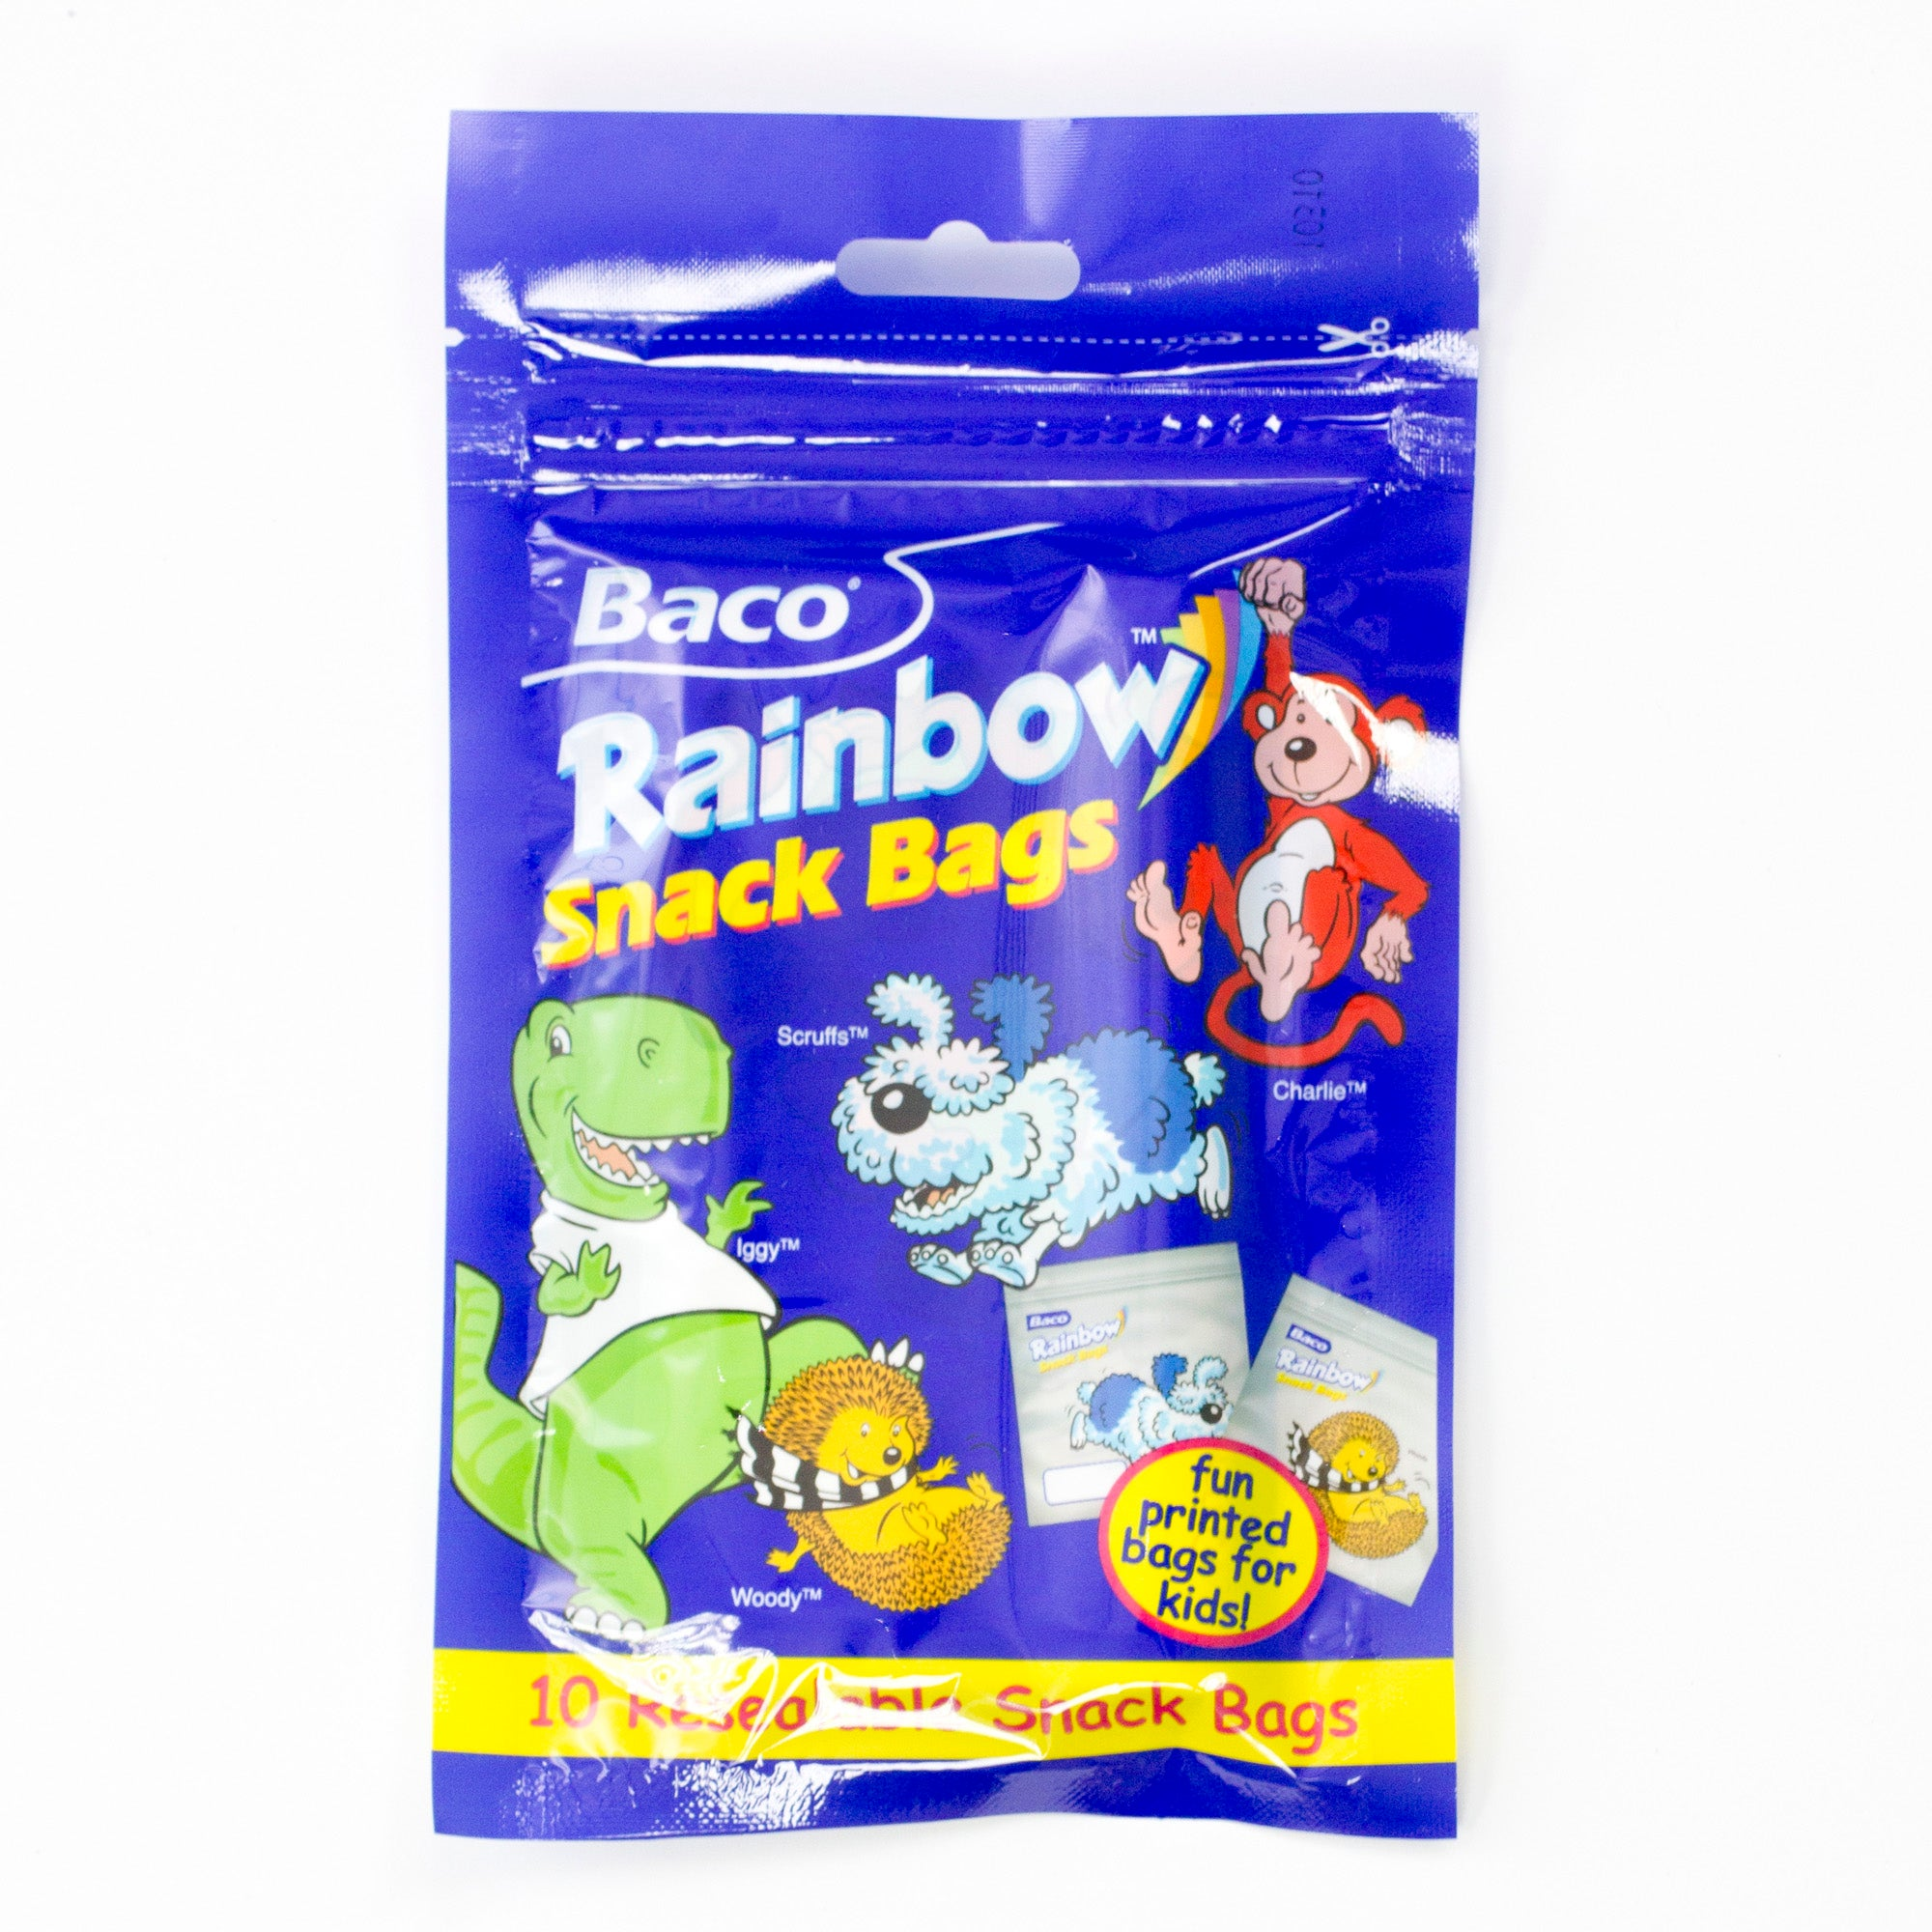 Baco Rainbow Snack Bags